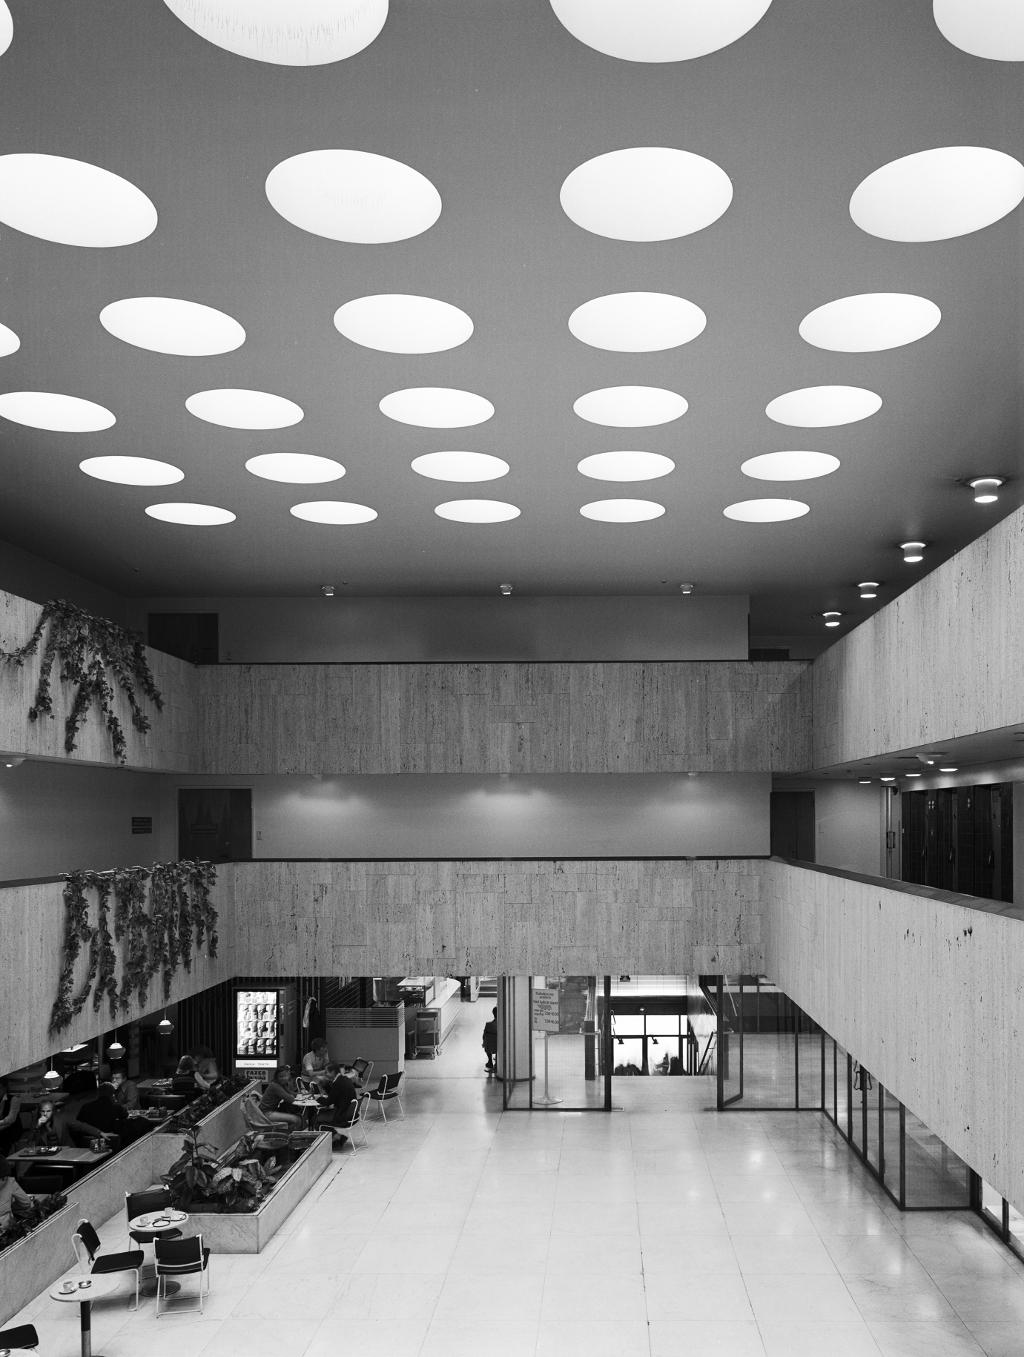 History Of Rautatalo Building Rautatalo By Alvar Aalto